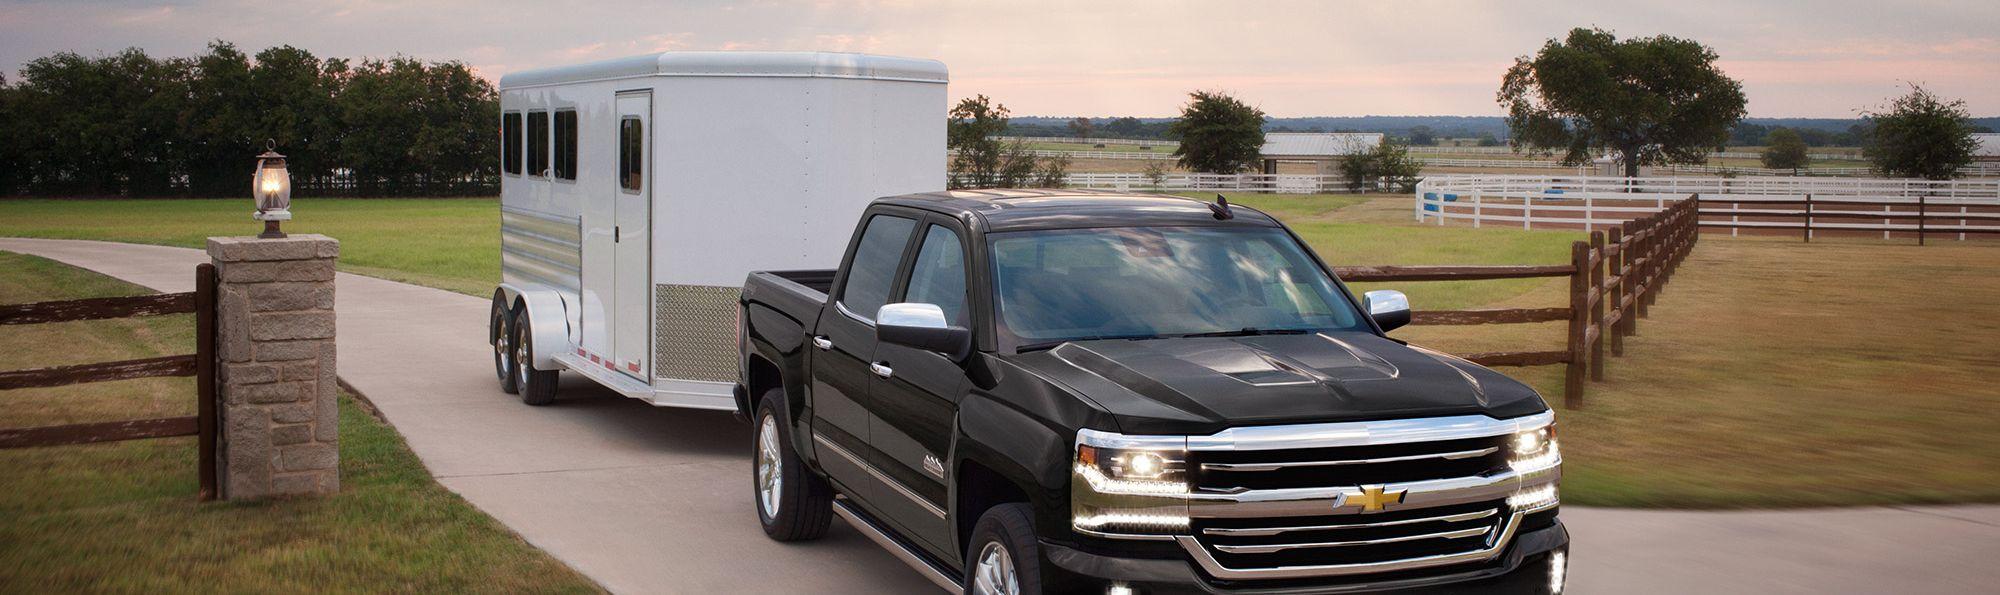 2018 Chevrolet Silverado 1500 Leasing near Worthington, MN